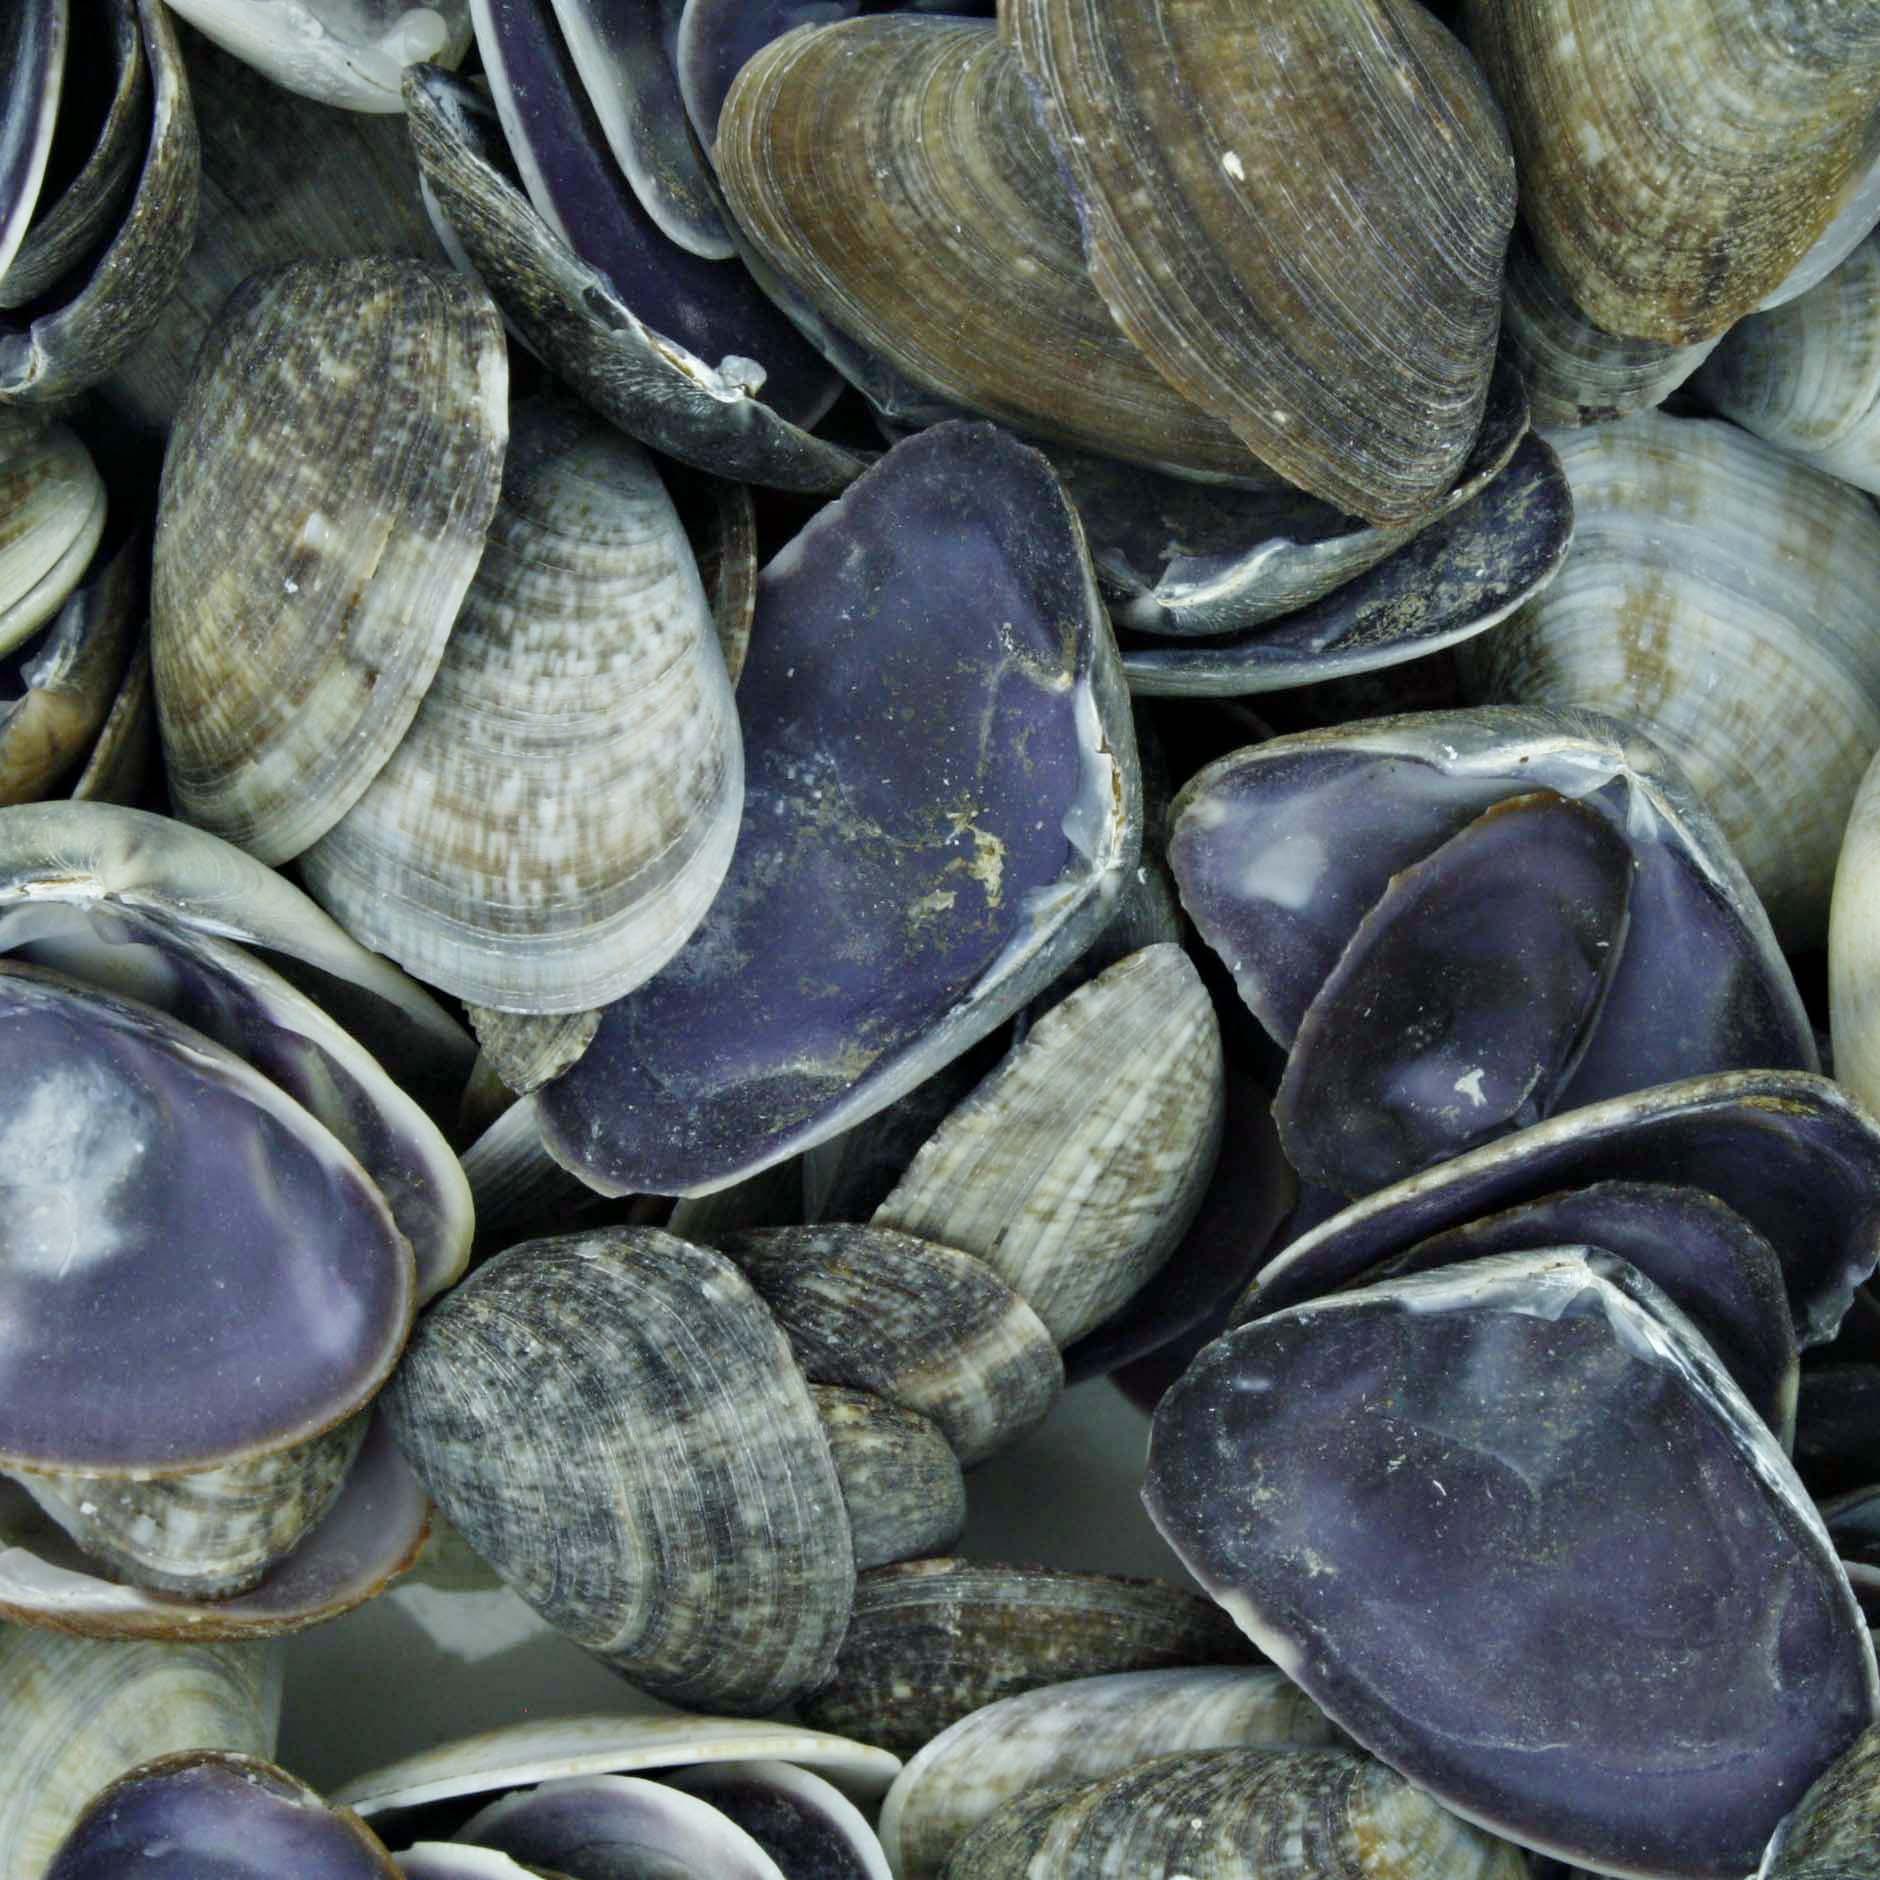 Concha - Cay Cay Shell Purple (Dosinia Trosheli)  - Stéphanie Bijoux® - Peças para Bijuterias e Artesanato